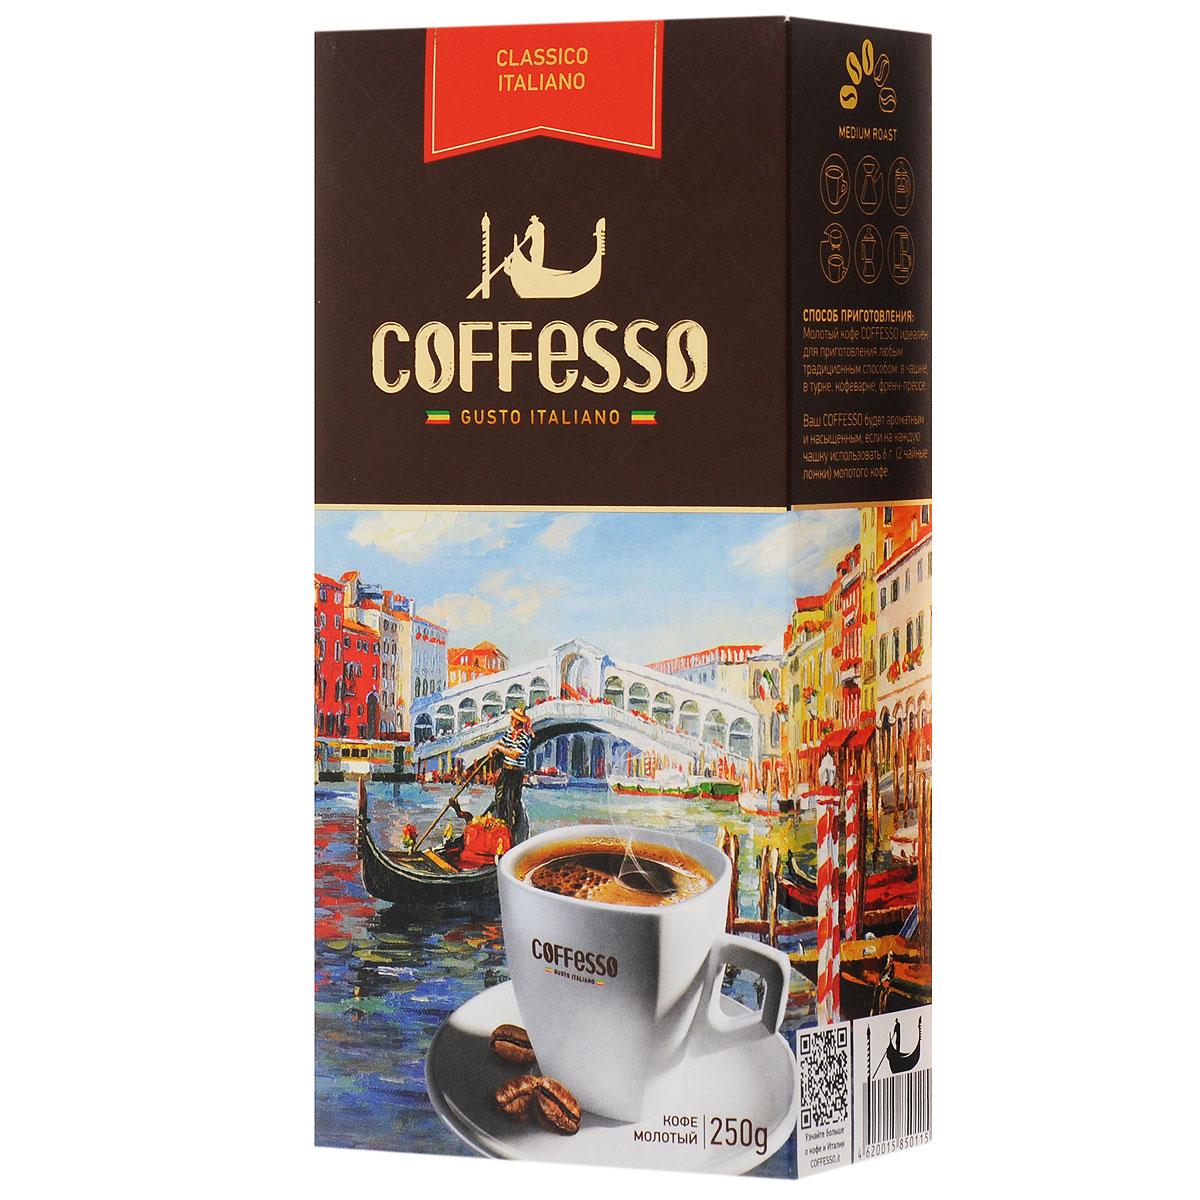 Coffesso Classico Italiano кофе молотый, 250 г